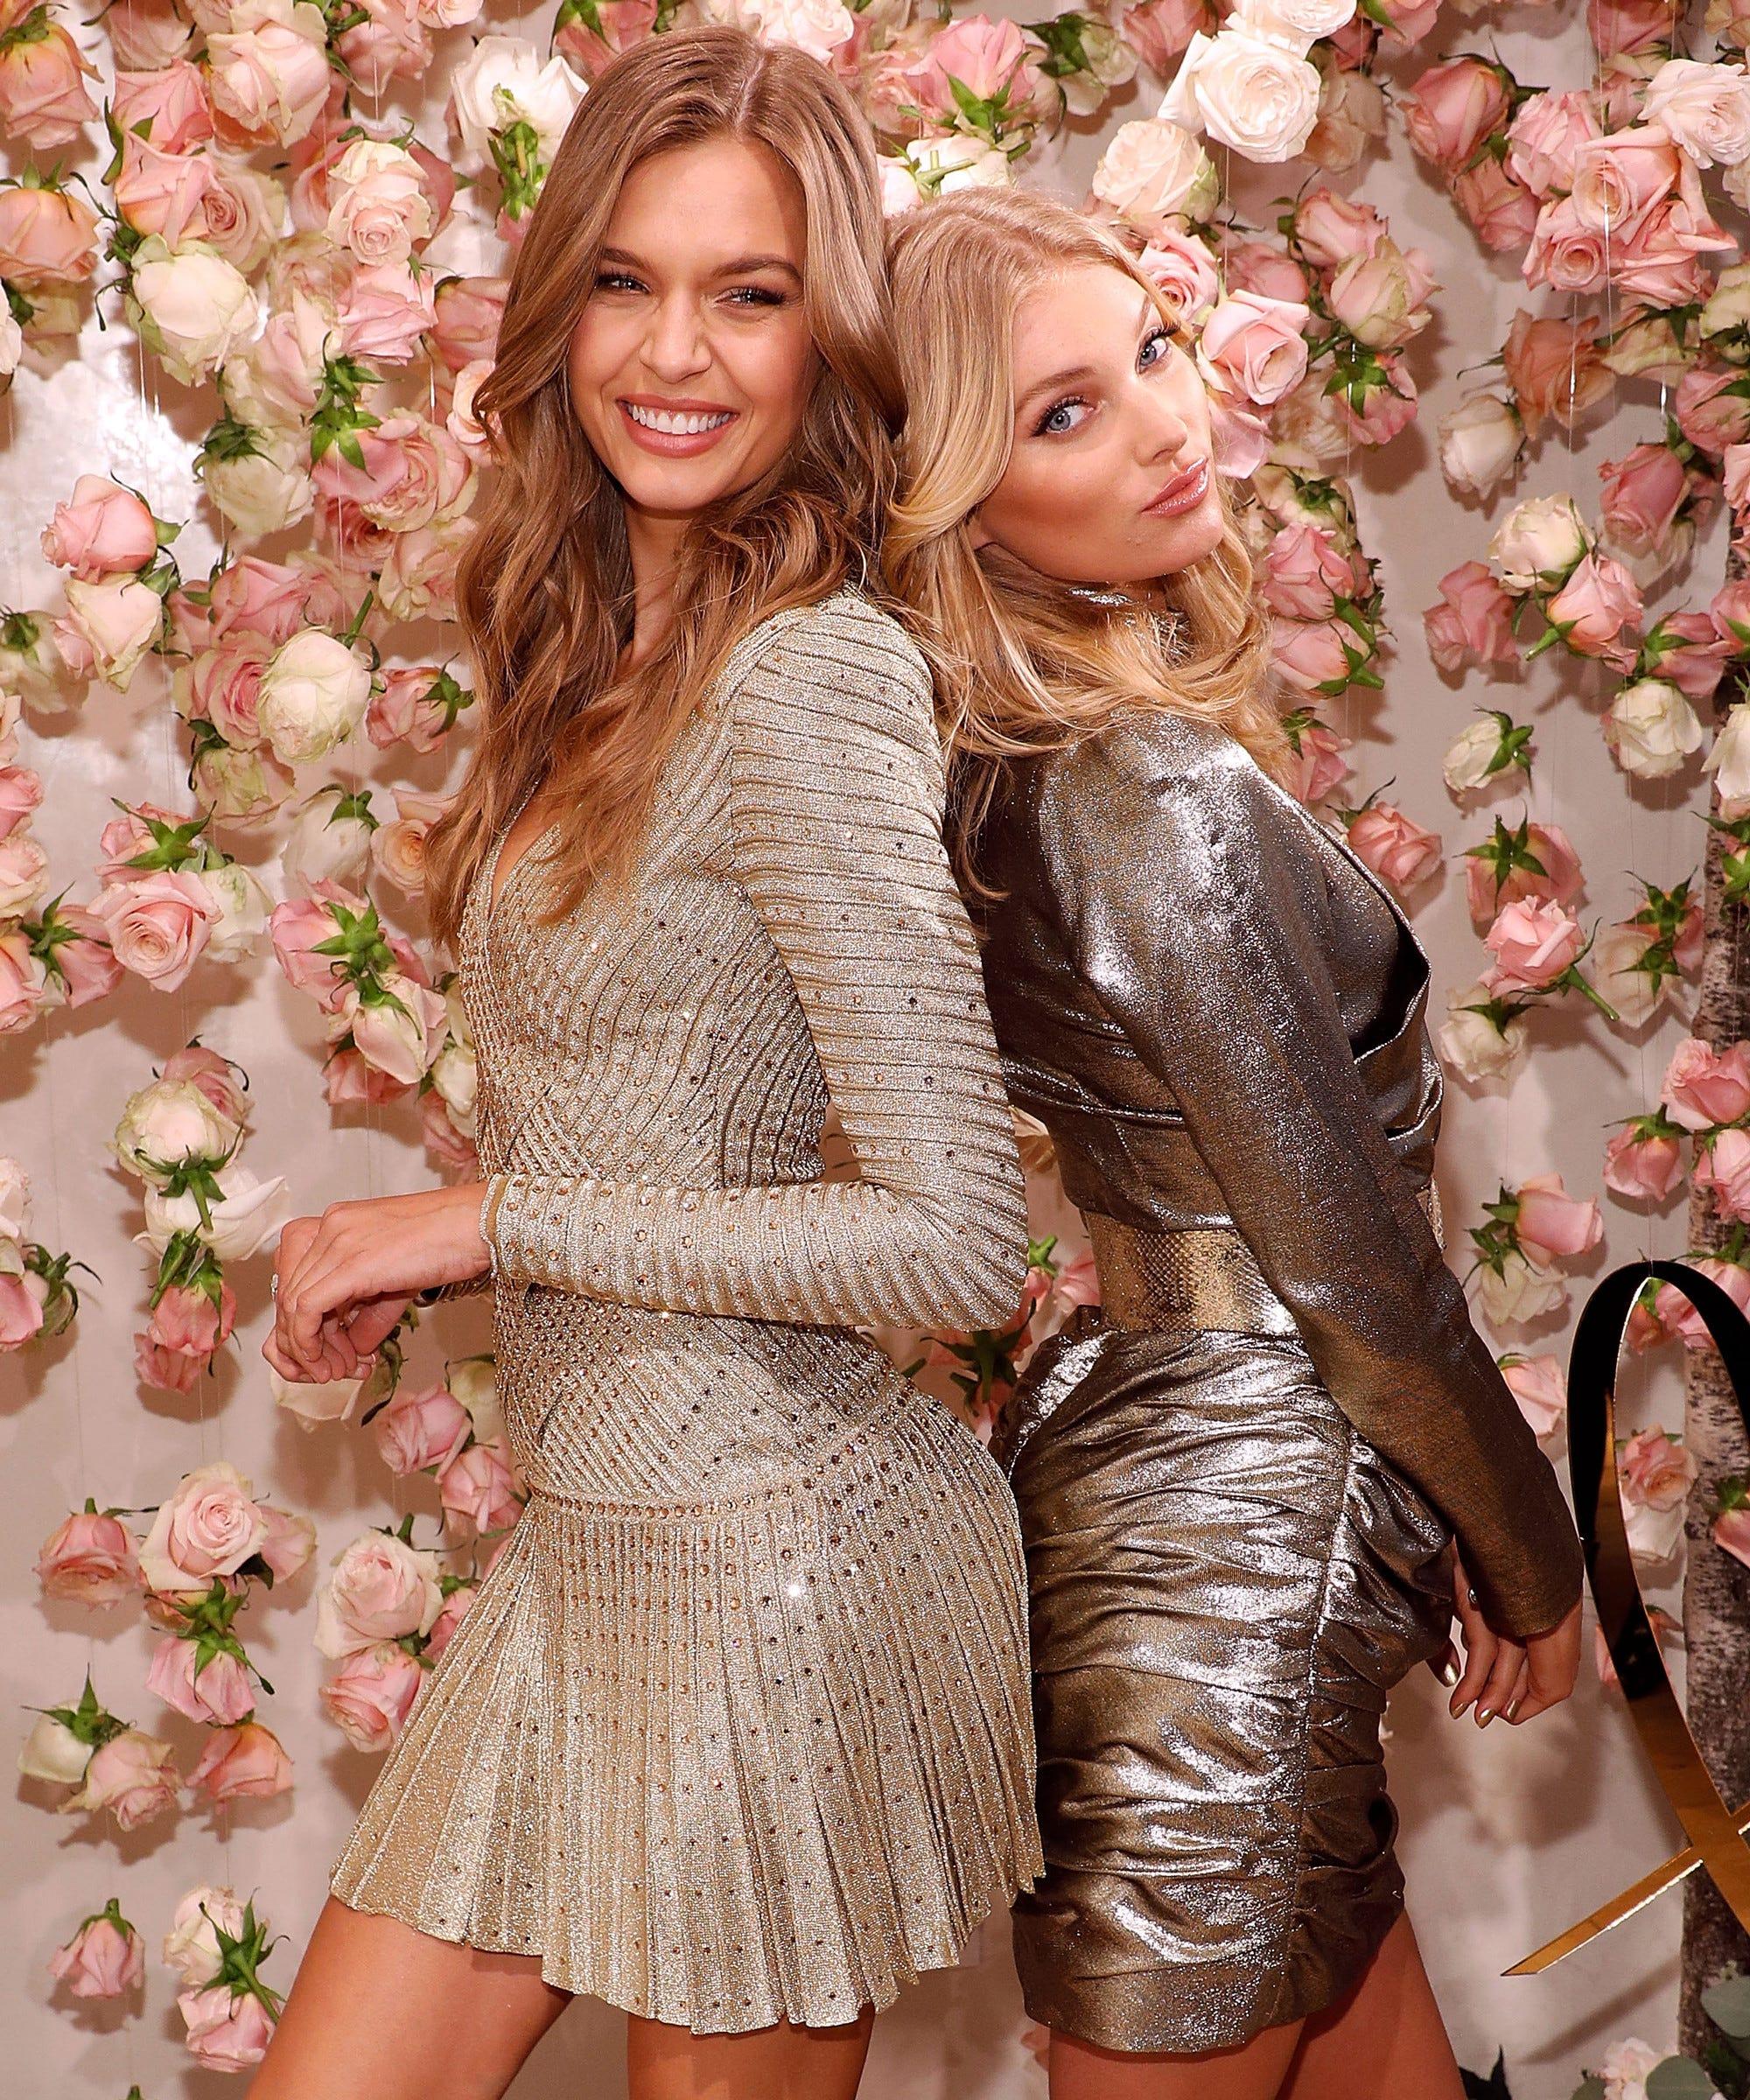 Victoria Secret News, Models, Stores, Fashion Show